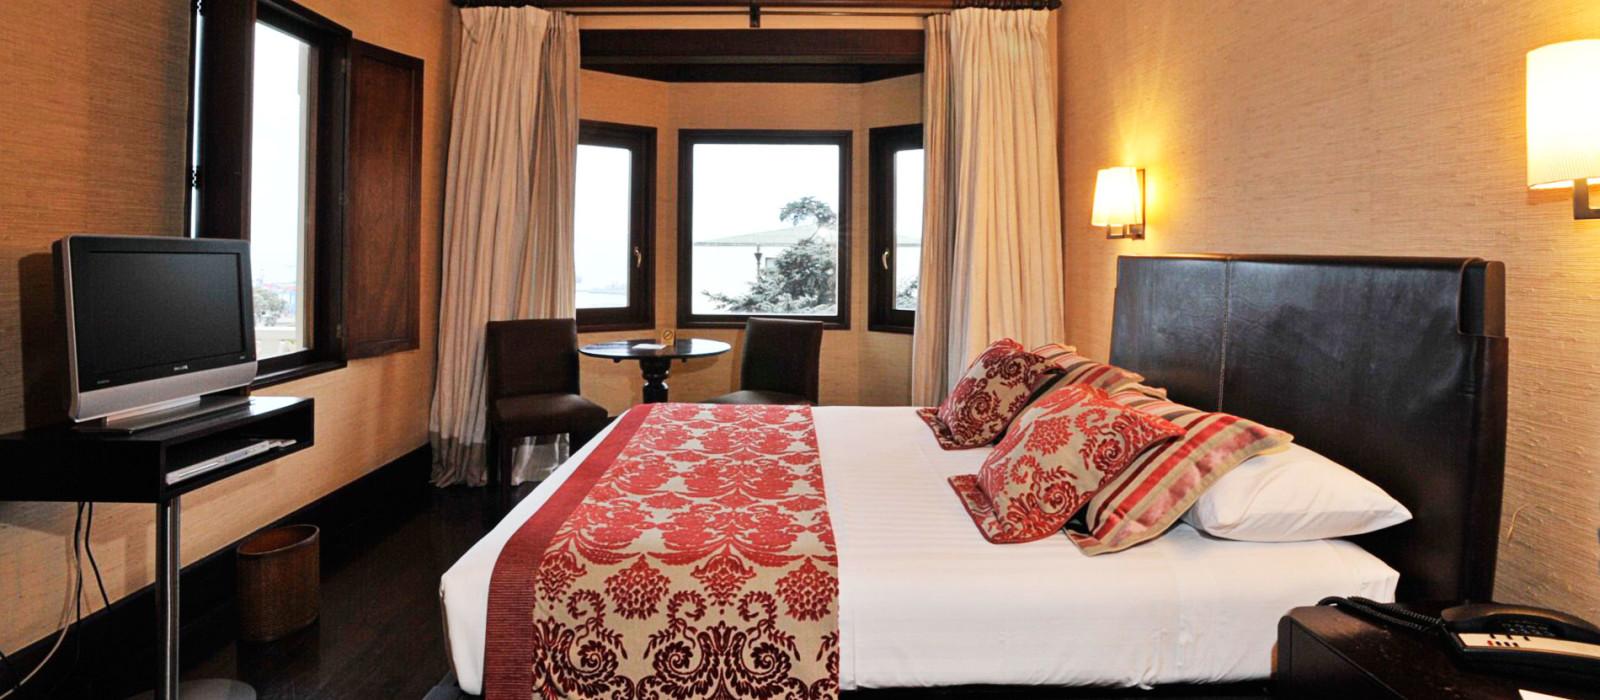 Hotel Casa Higueras Chile